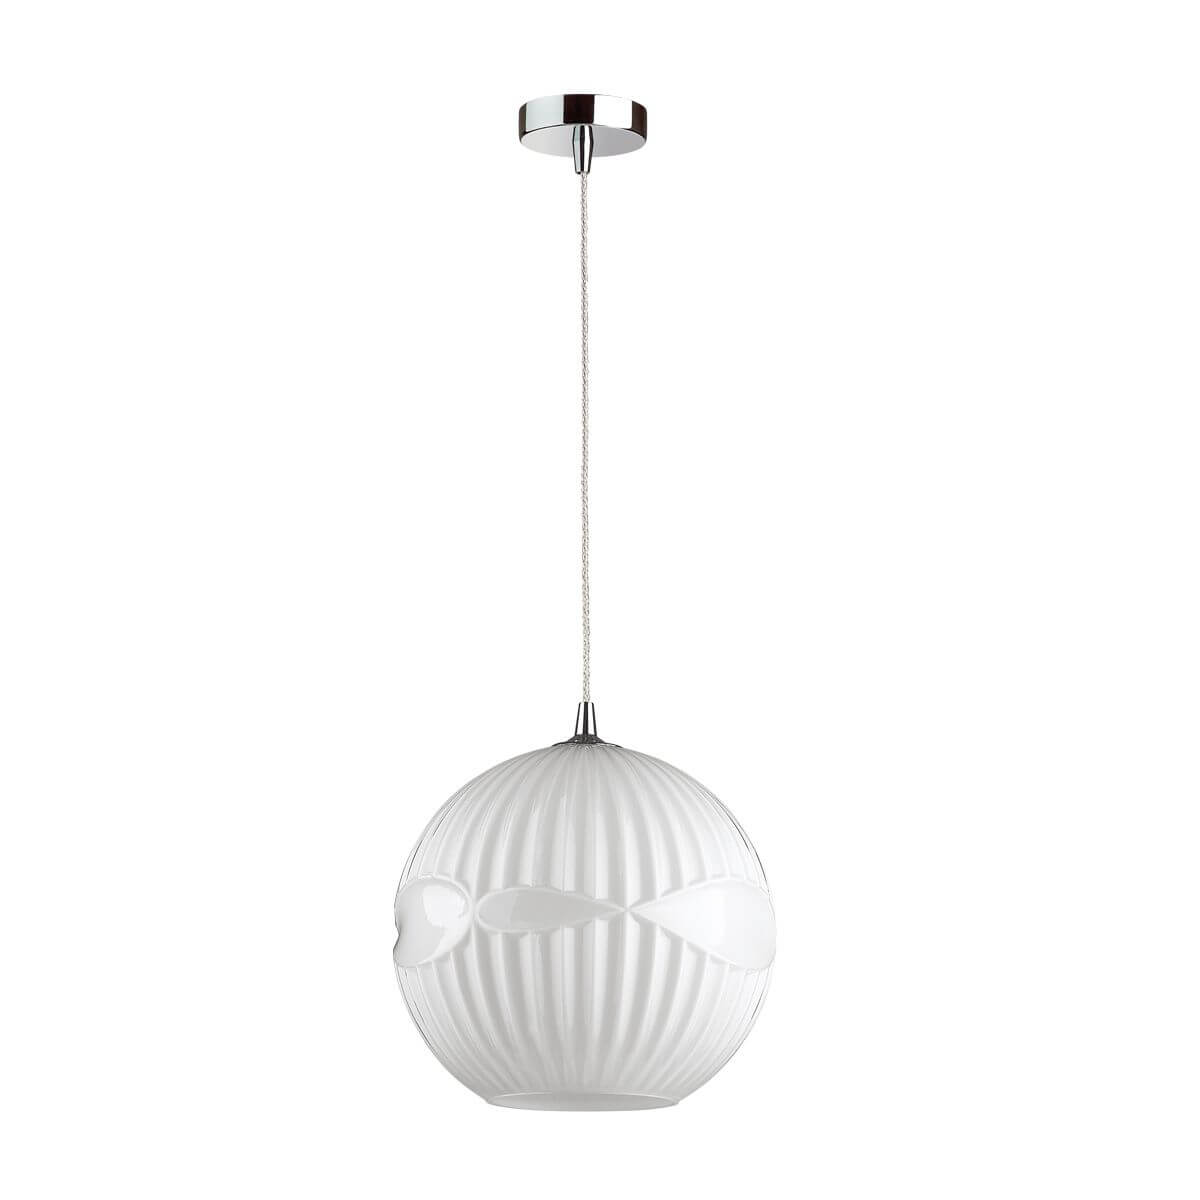 Светильник Odeon Light 4749/1 Pendant светильник odeon light 4140 1 pendant